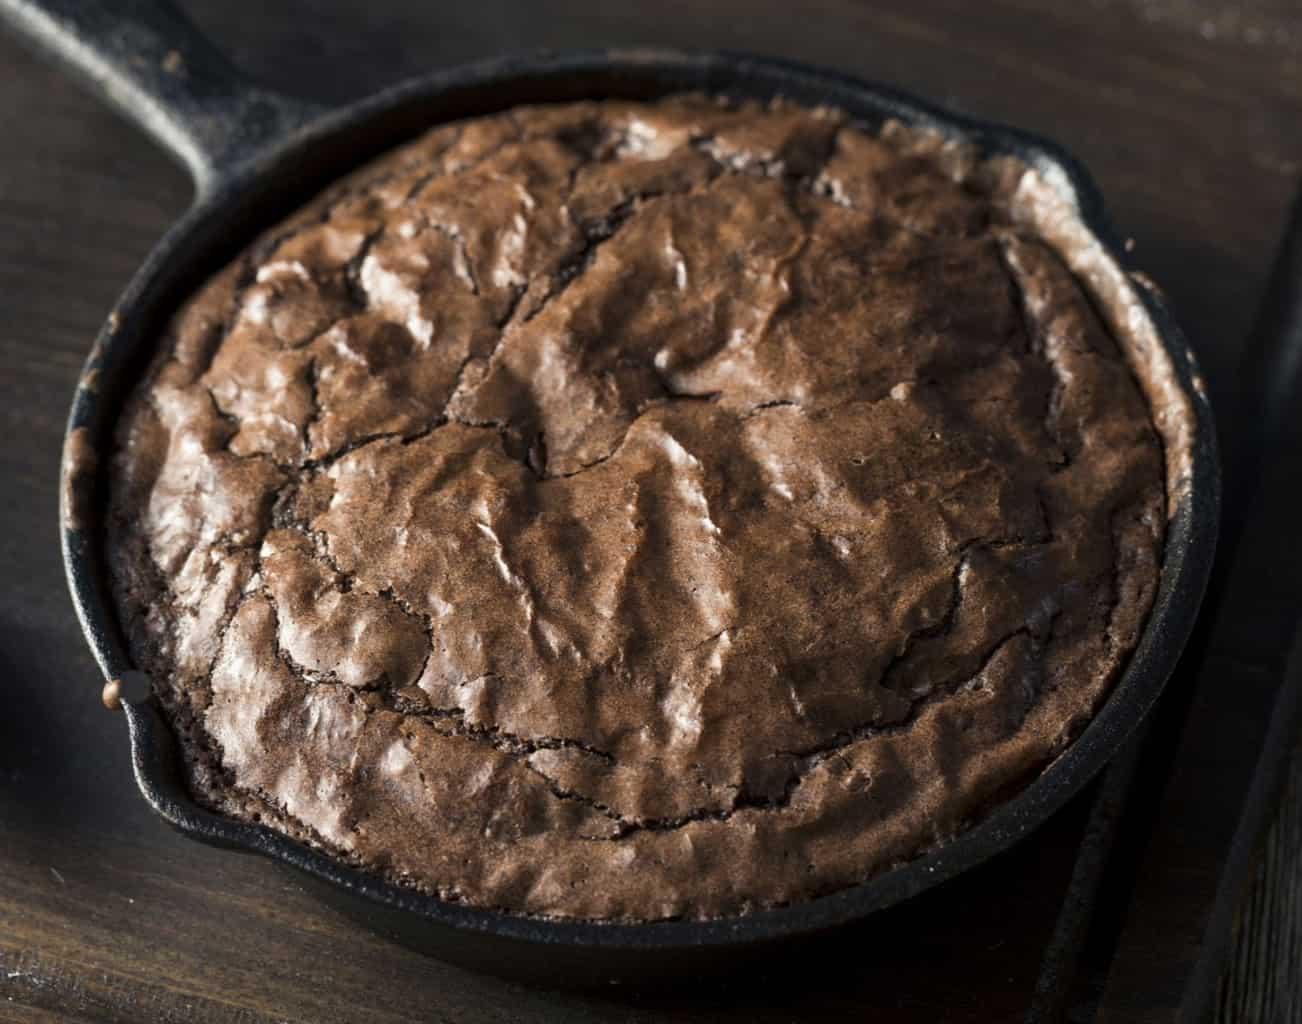 keto skillet brownie up close